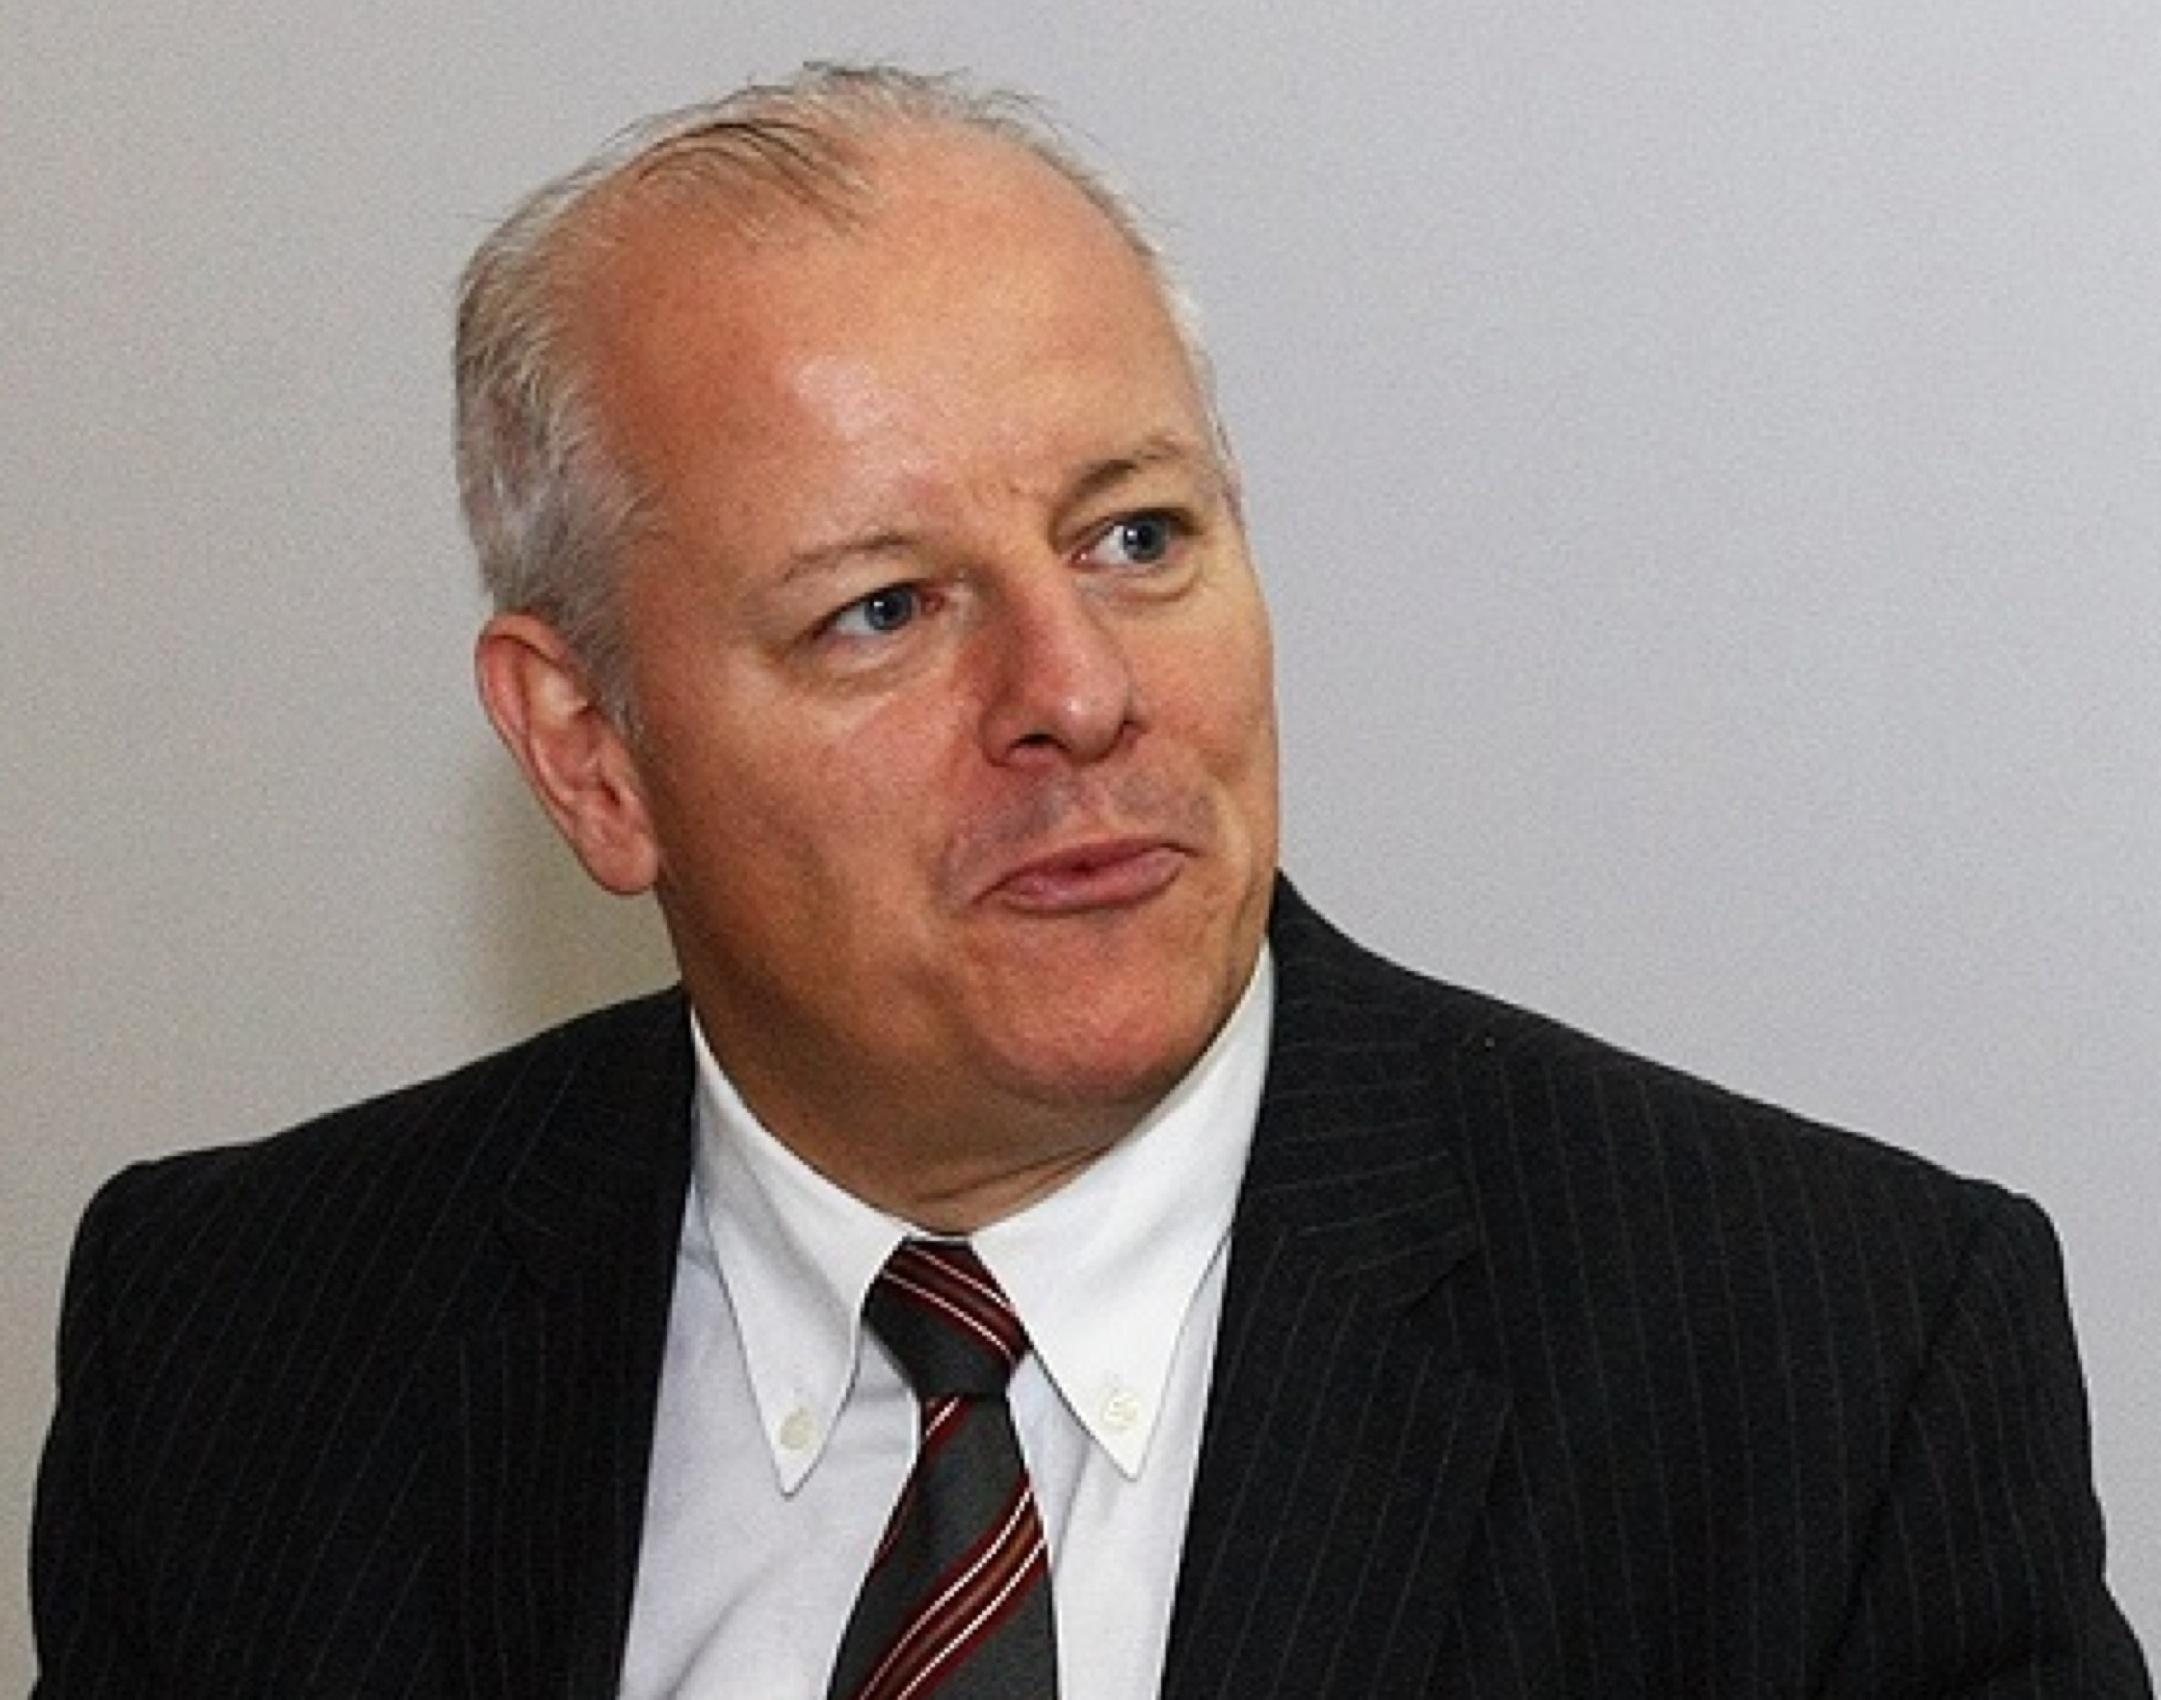 Shawn Healy tax director at BDO